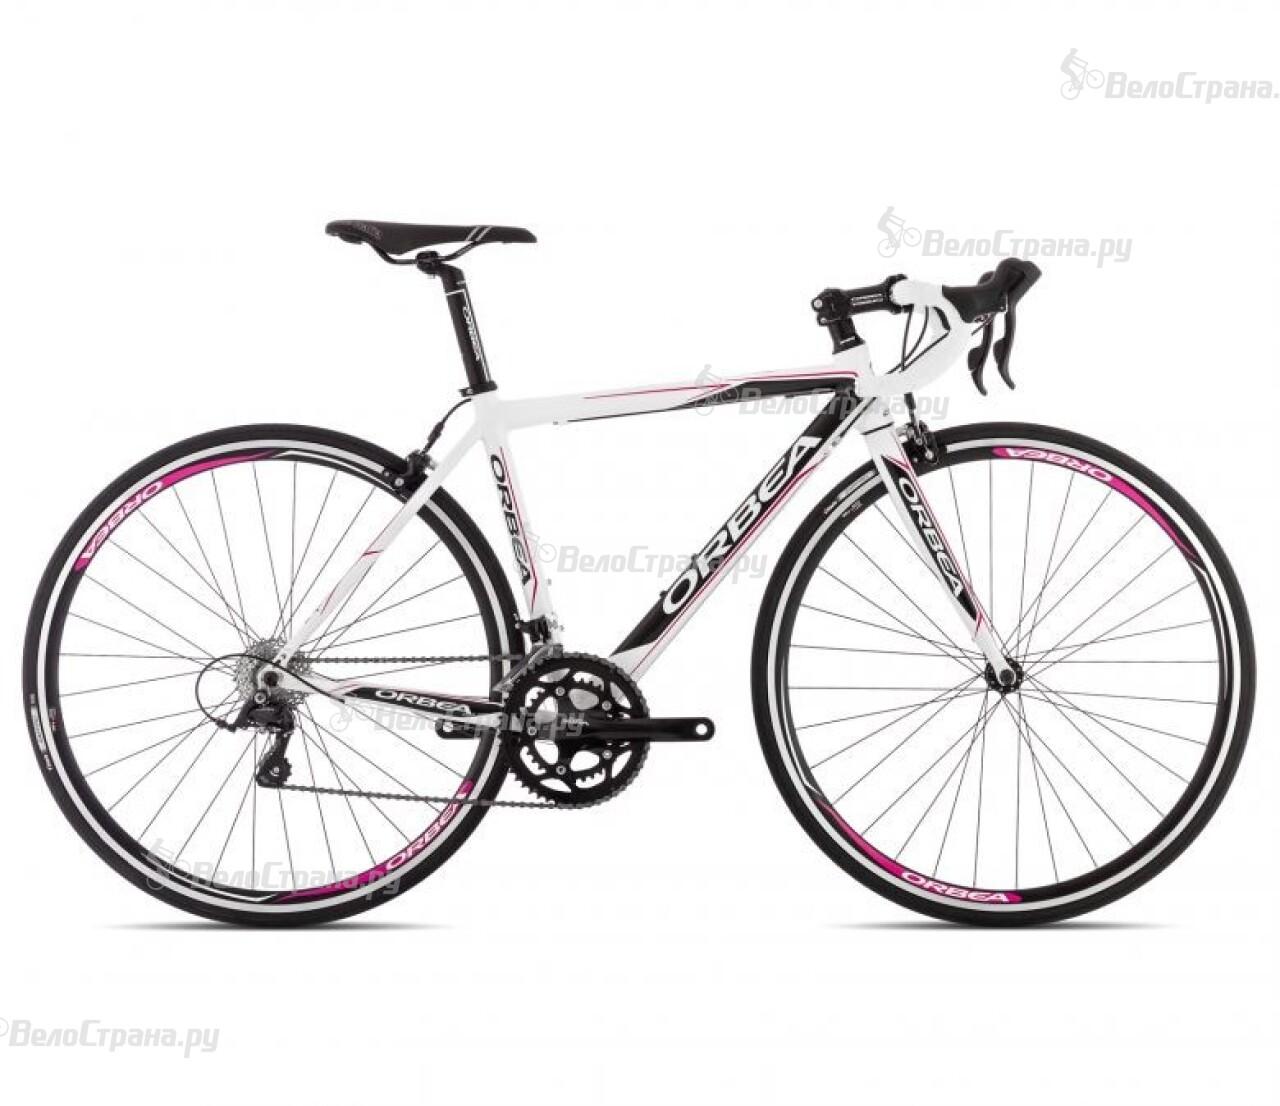 Велосипед Orbea Aqua Dama 30 (2014) велосипед orbea orca dama gth 2013